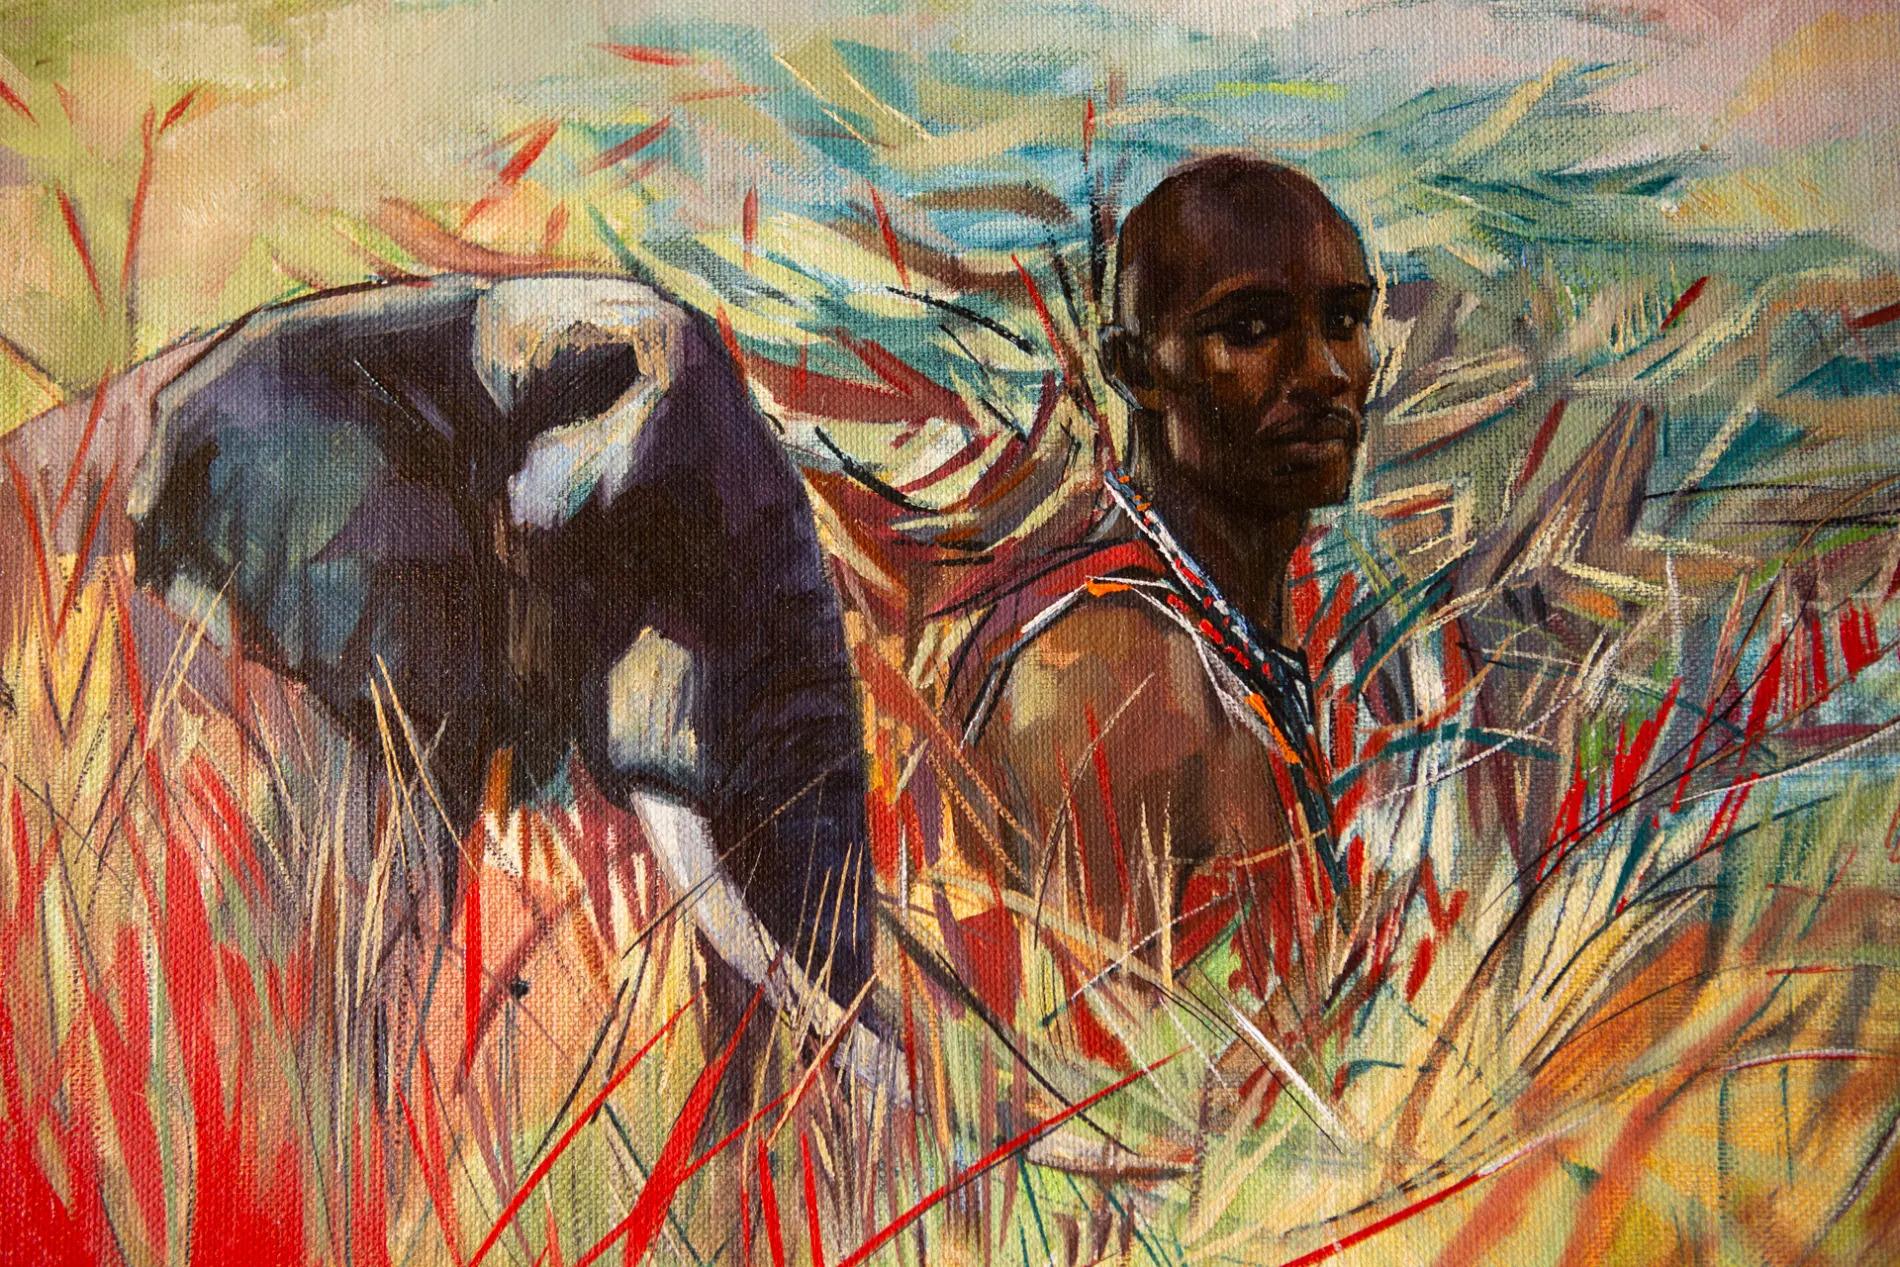 Emily Lamb Maasai and Elephant